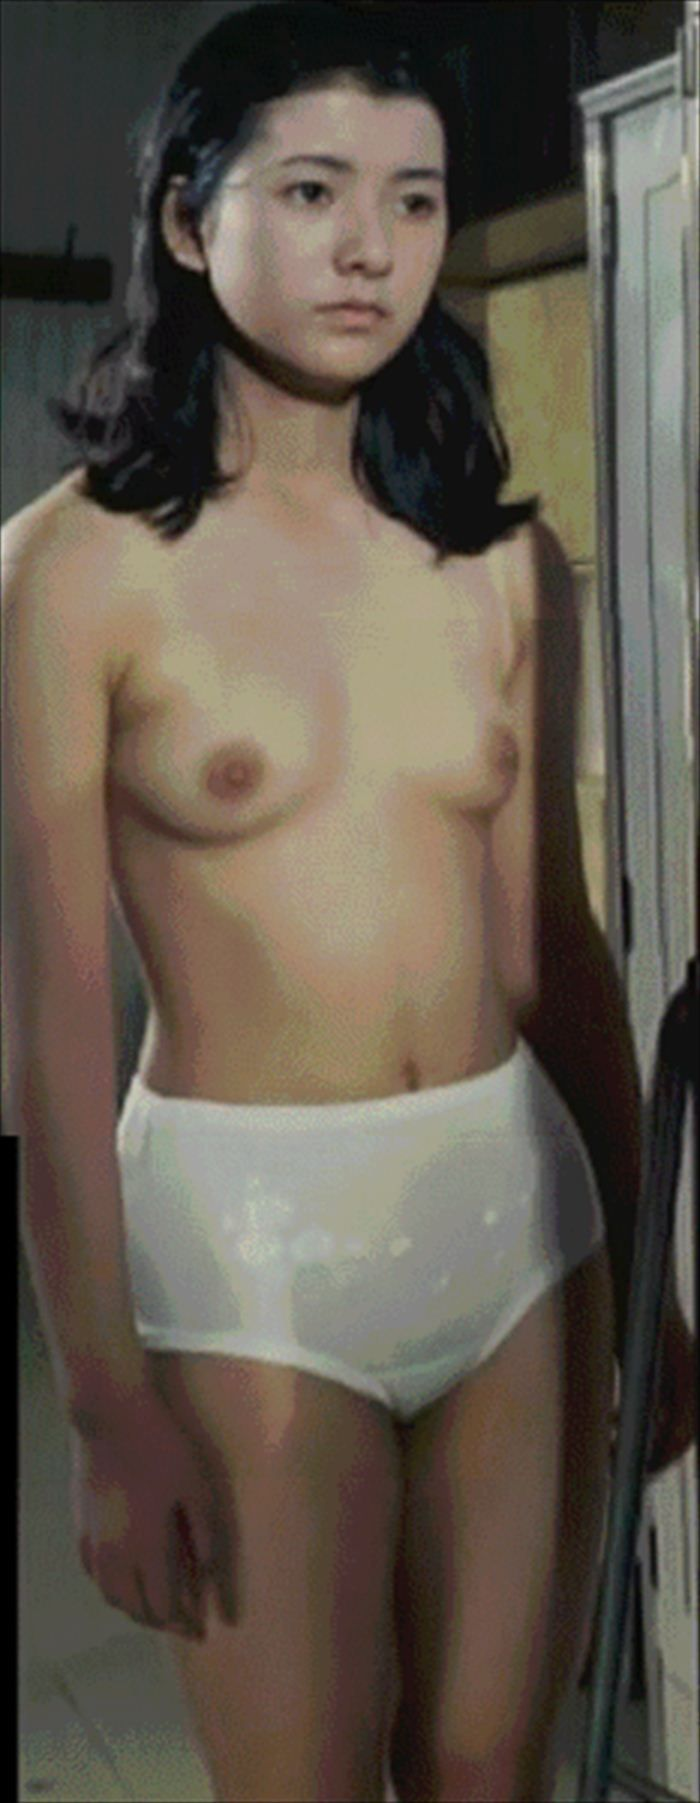 昭和女子小学生ポルノ写真u12 ロリ 全裸